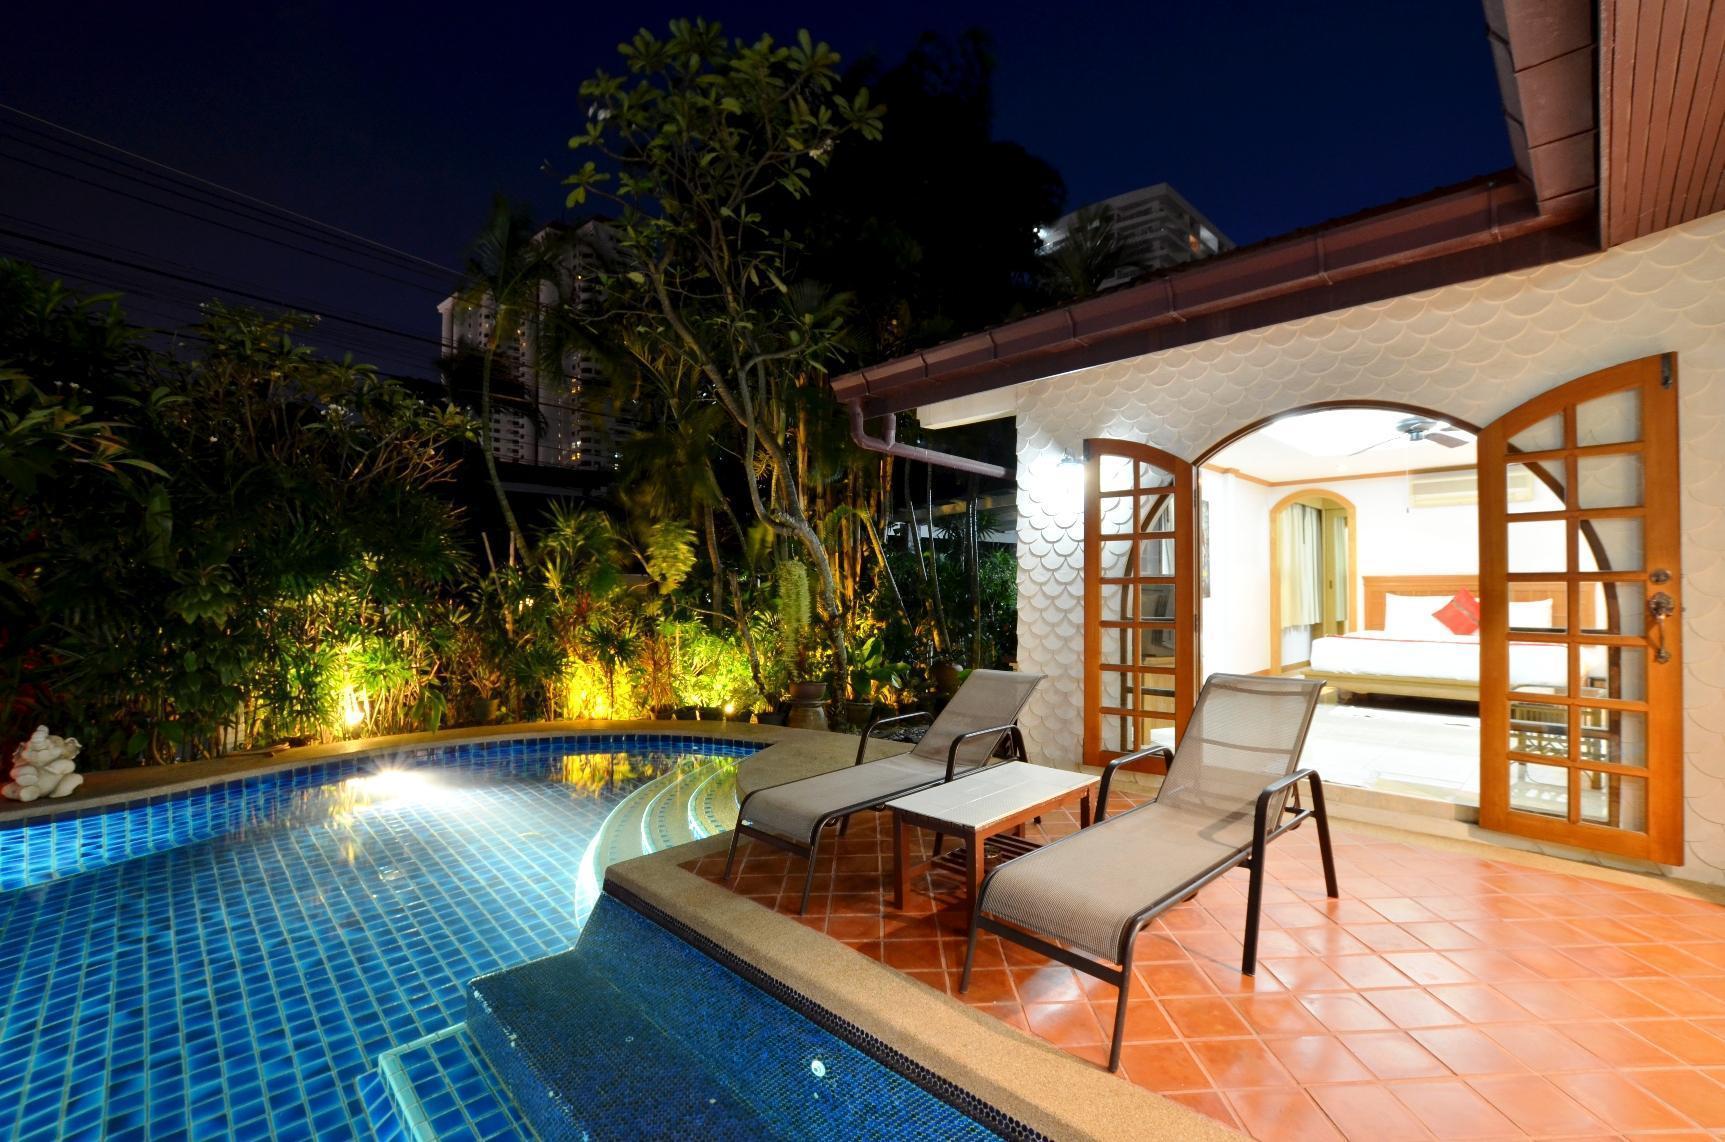 Grand Condo Wasana Pool villa300meter from beach แกรนด์คอนโดวาสนาพูลวิลล่า